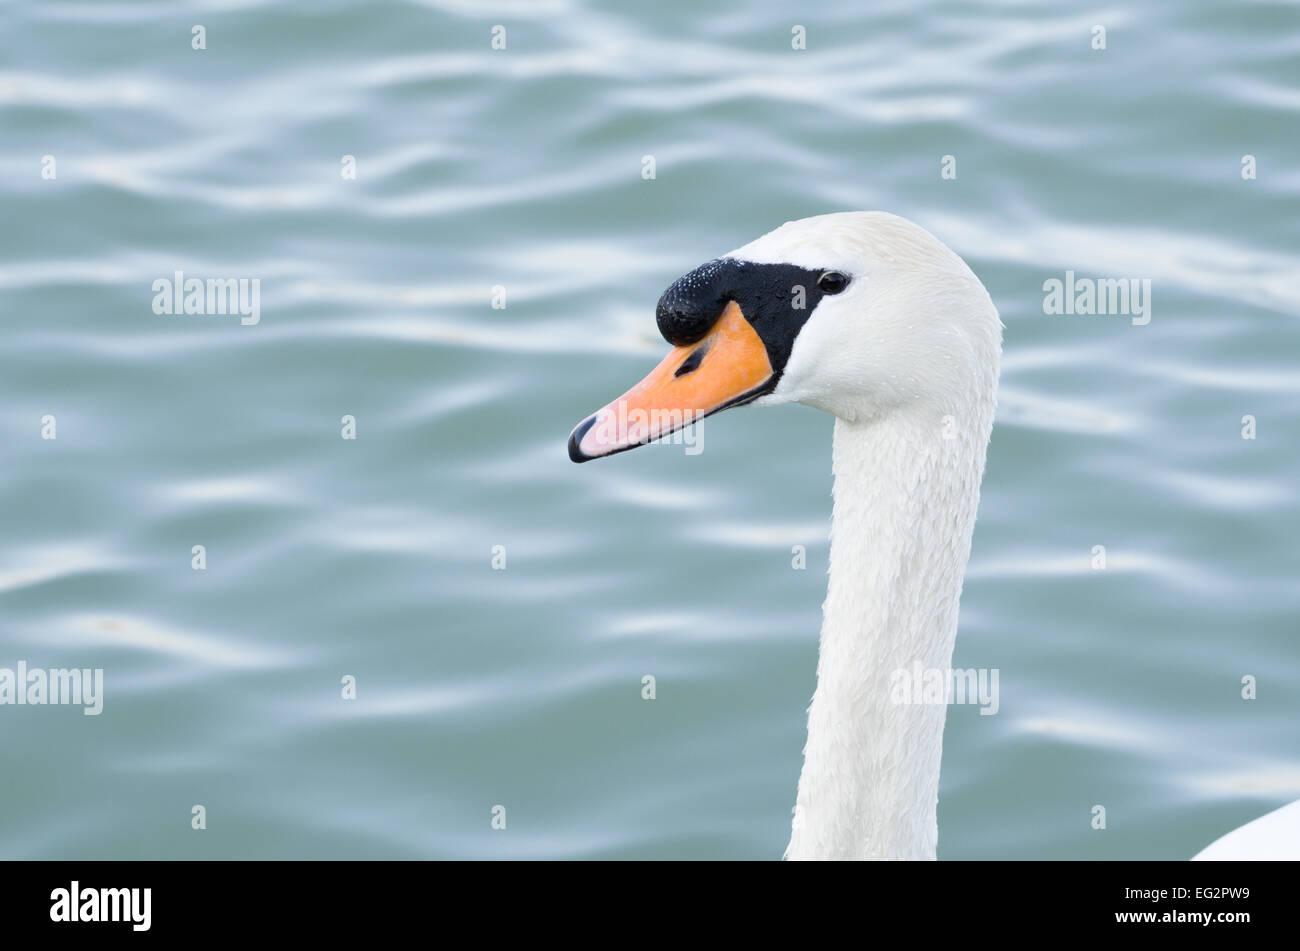 Mute Swan Head in front of Wavy Water Stock Photo